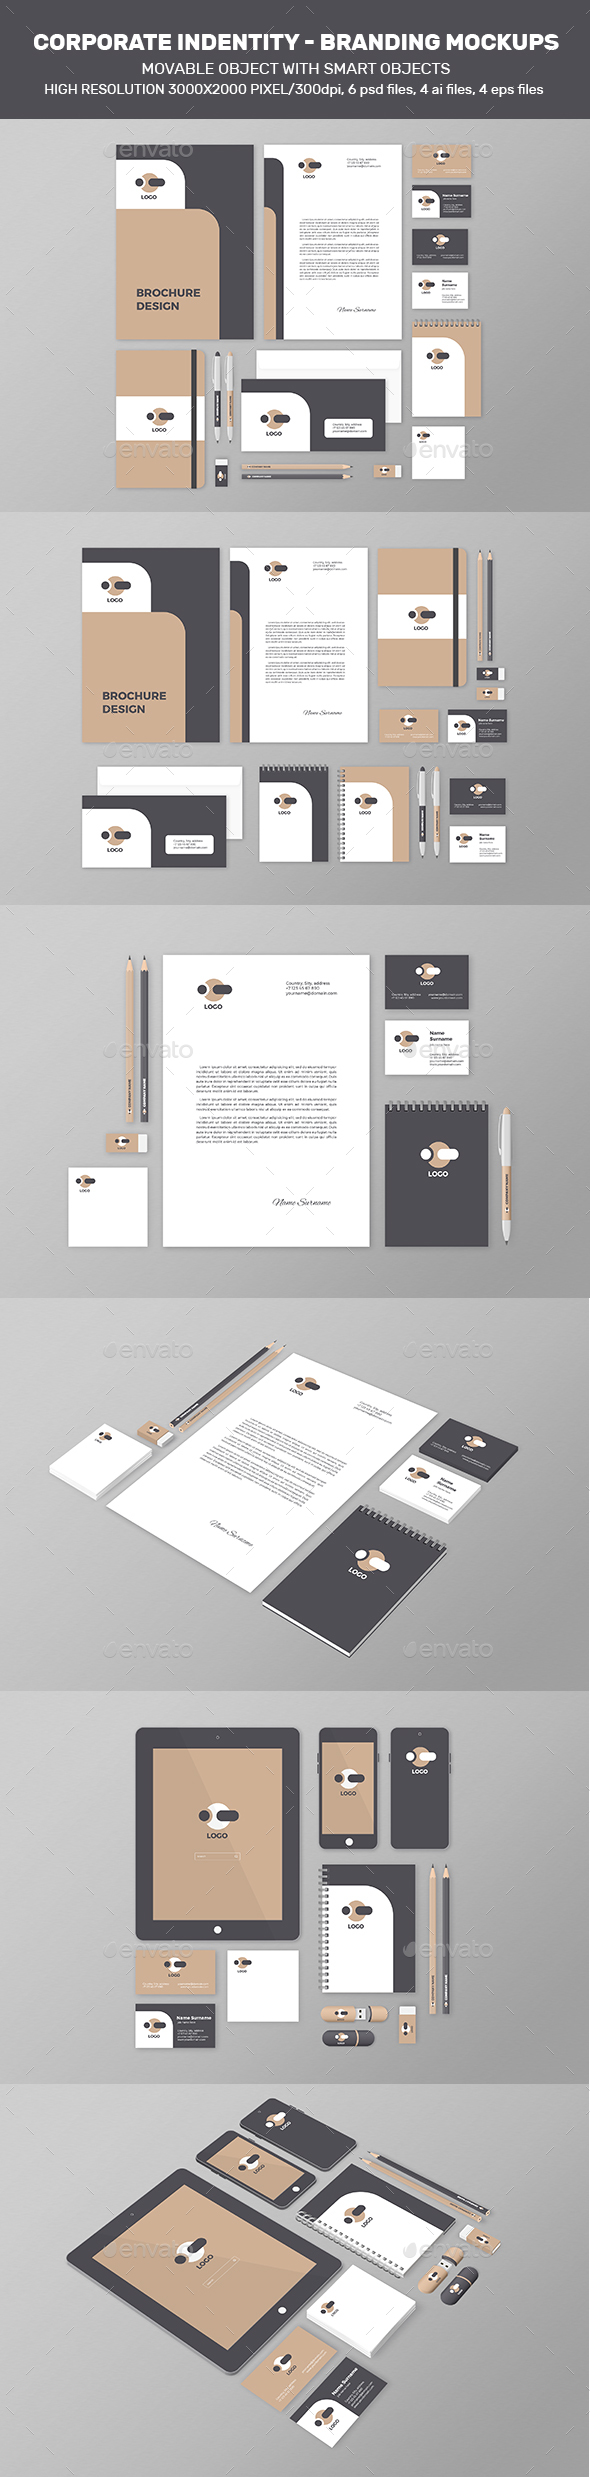 Corporate Identity – Branding Mock-Up - Stationery Print